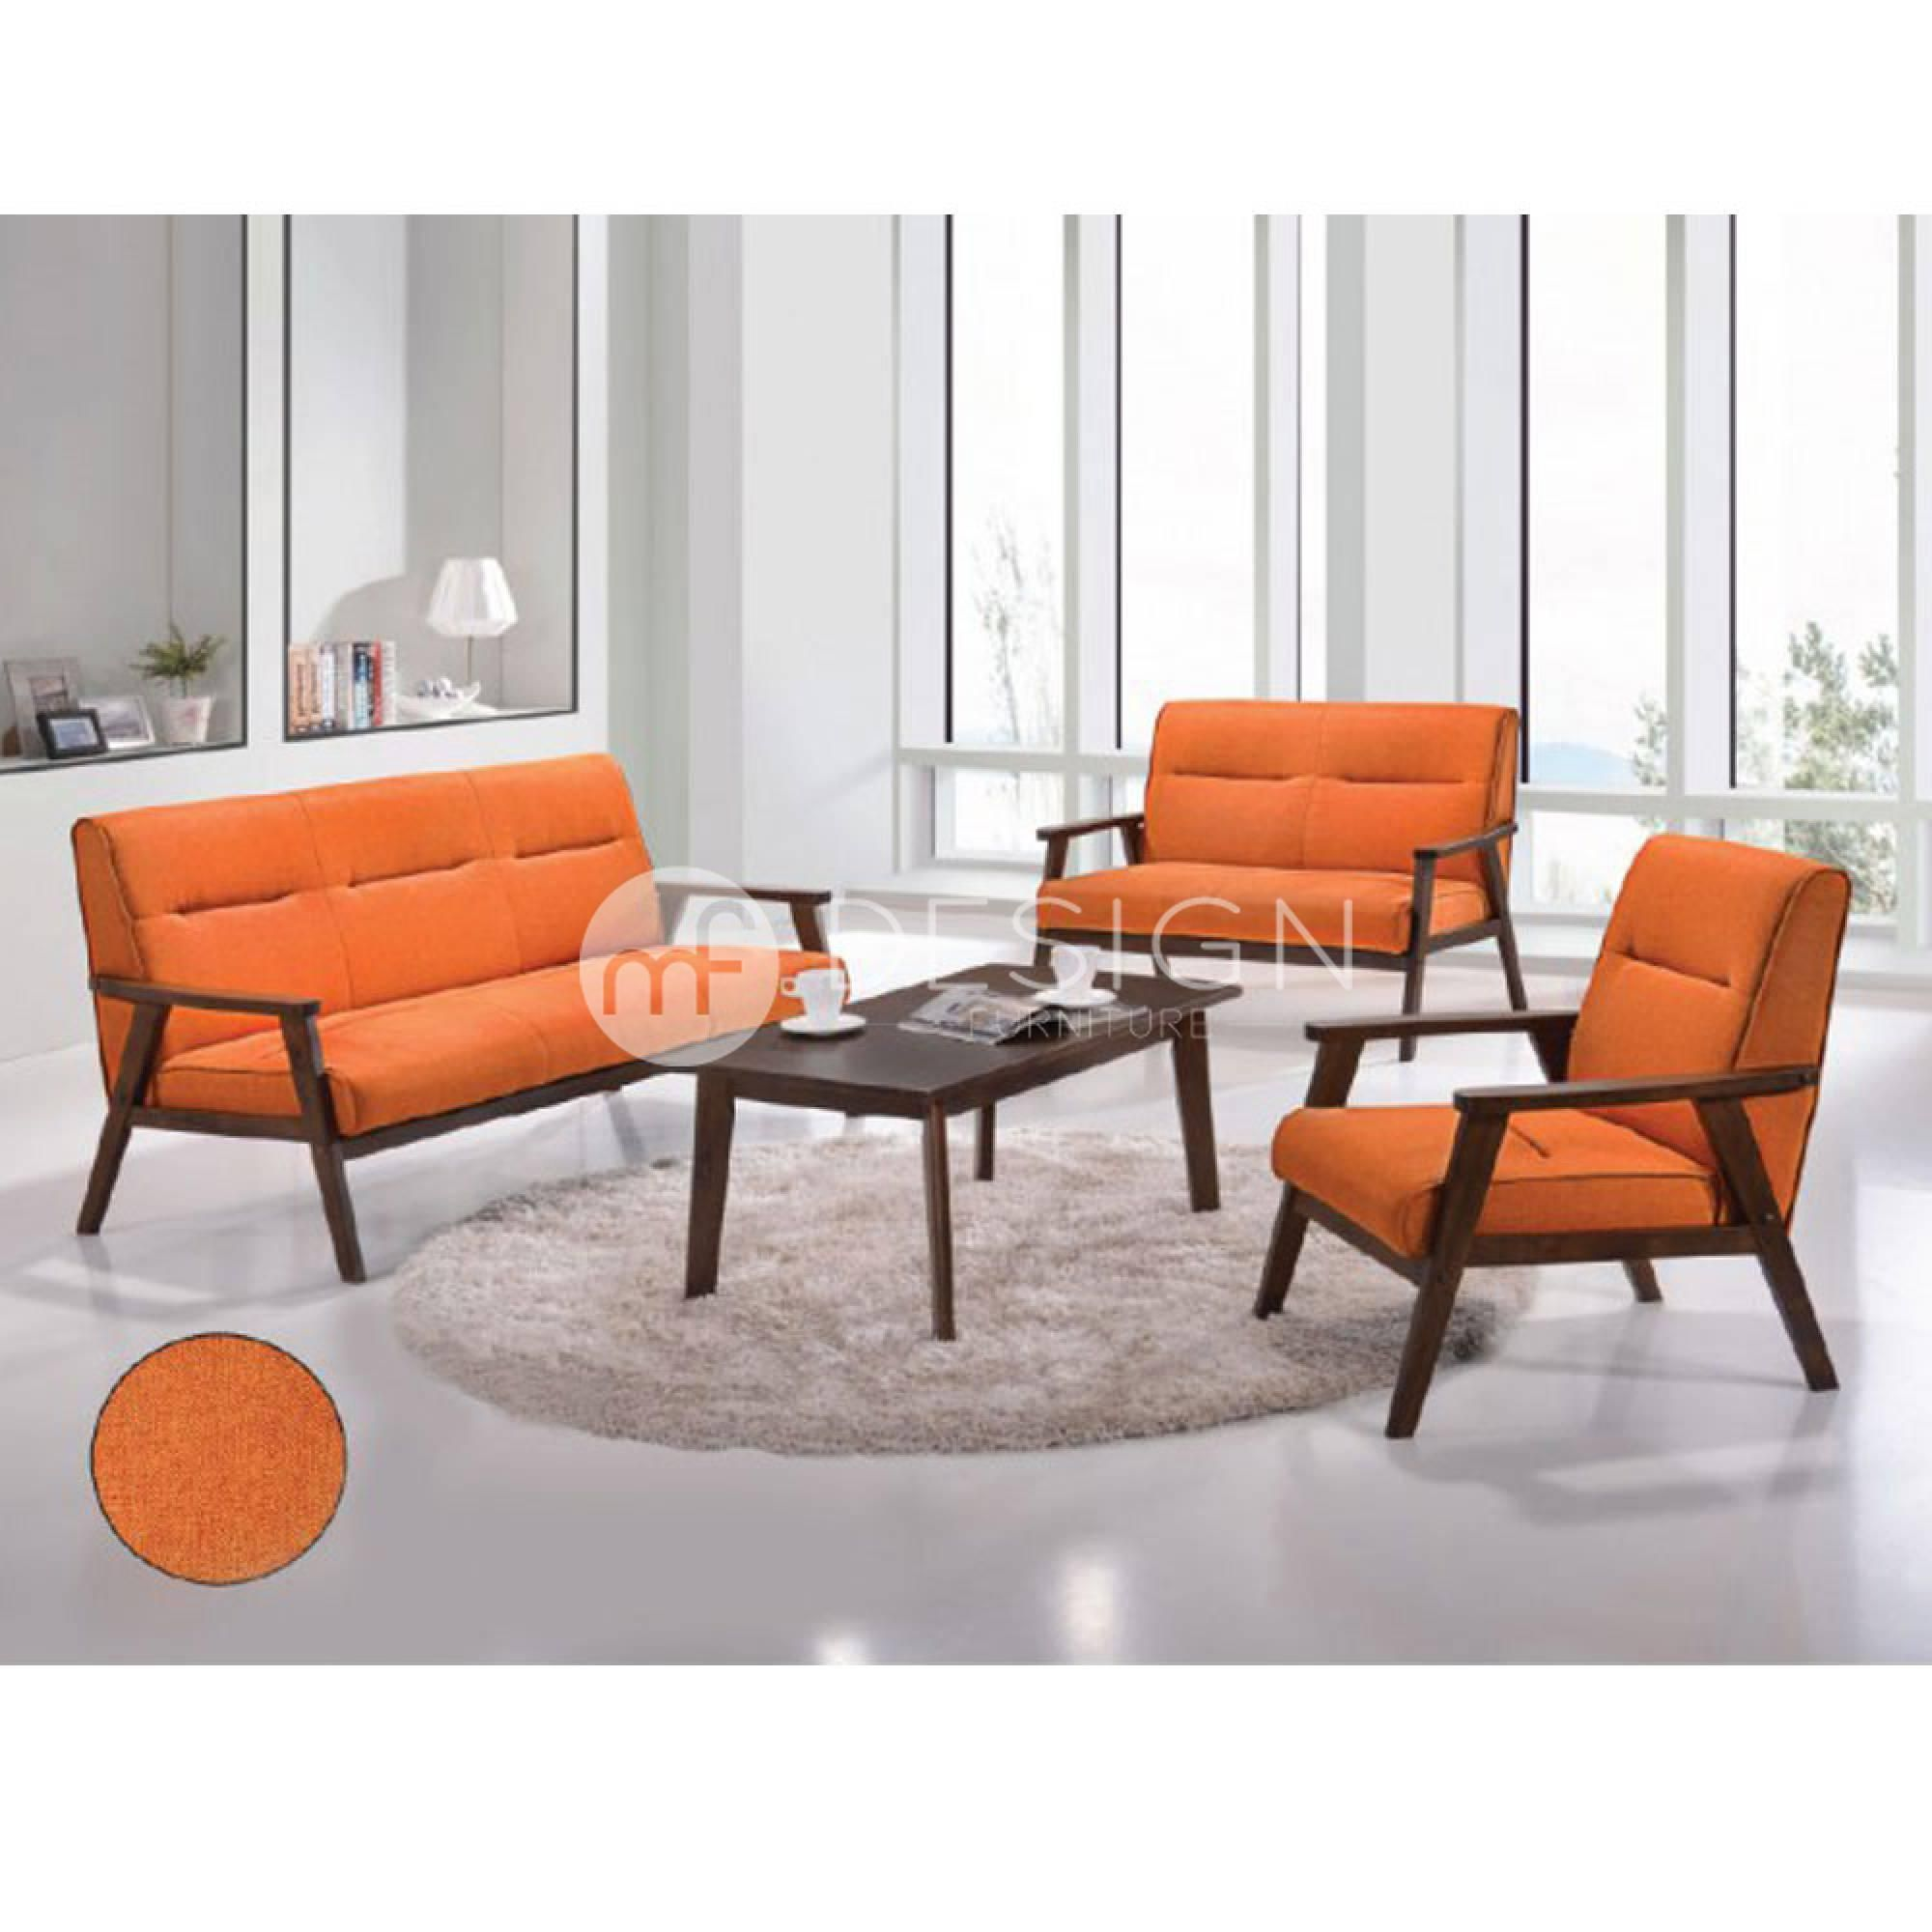 Nest 1 2 3 Antique Sofa Set Orange Mf Design Malaysian Favourite Design Furniture Sofa Set Living Room Furniture